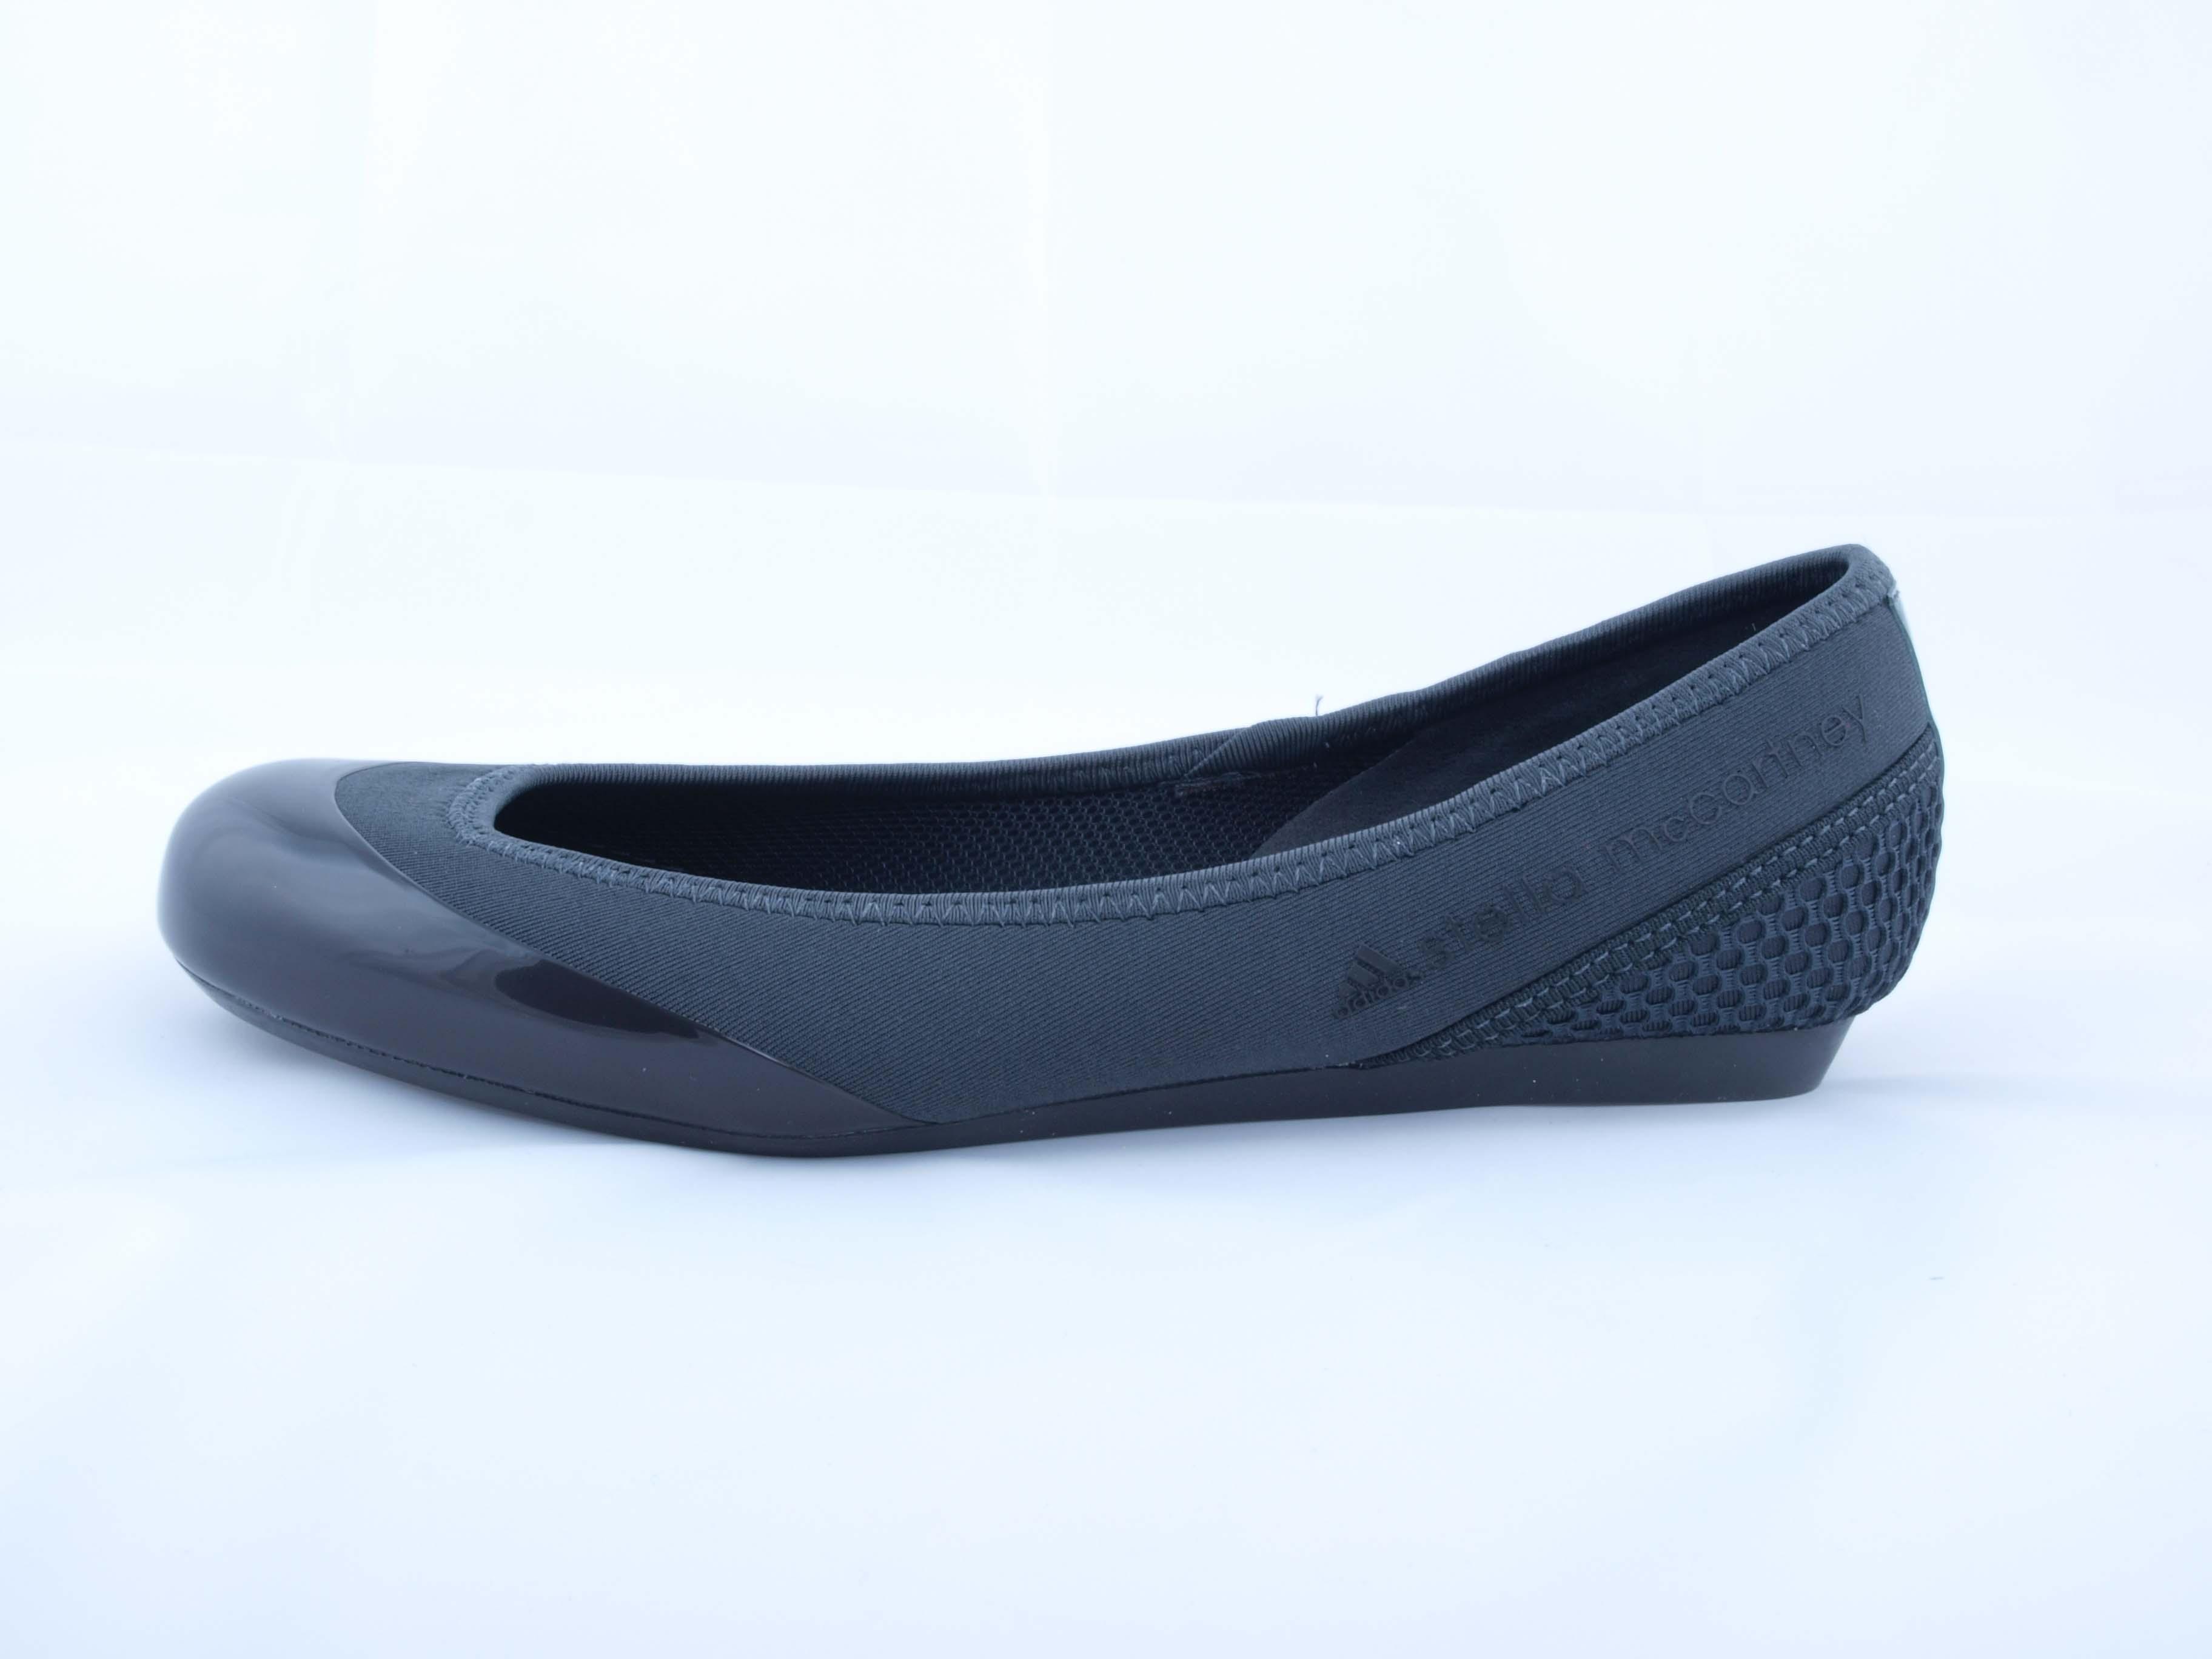 Adidas Psitacula Ballerina Shoes